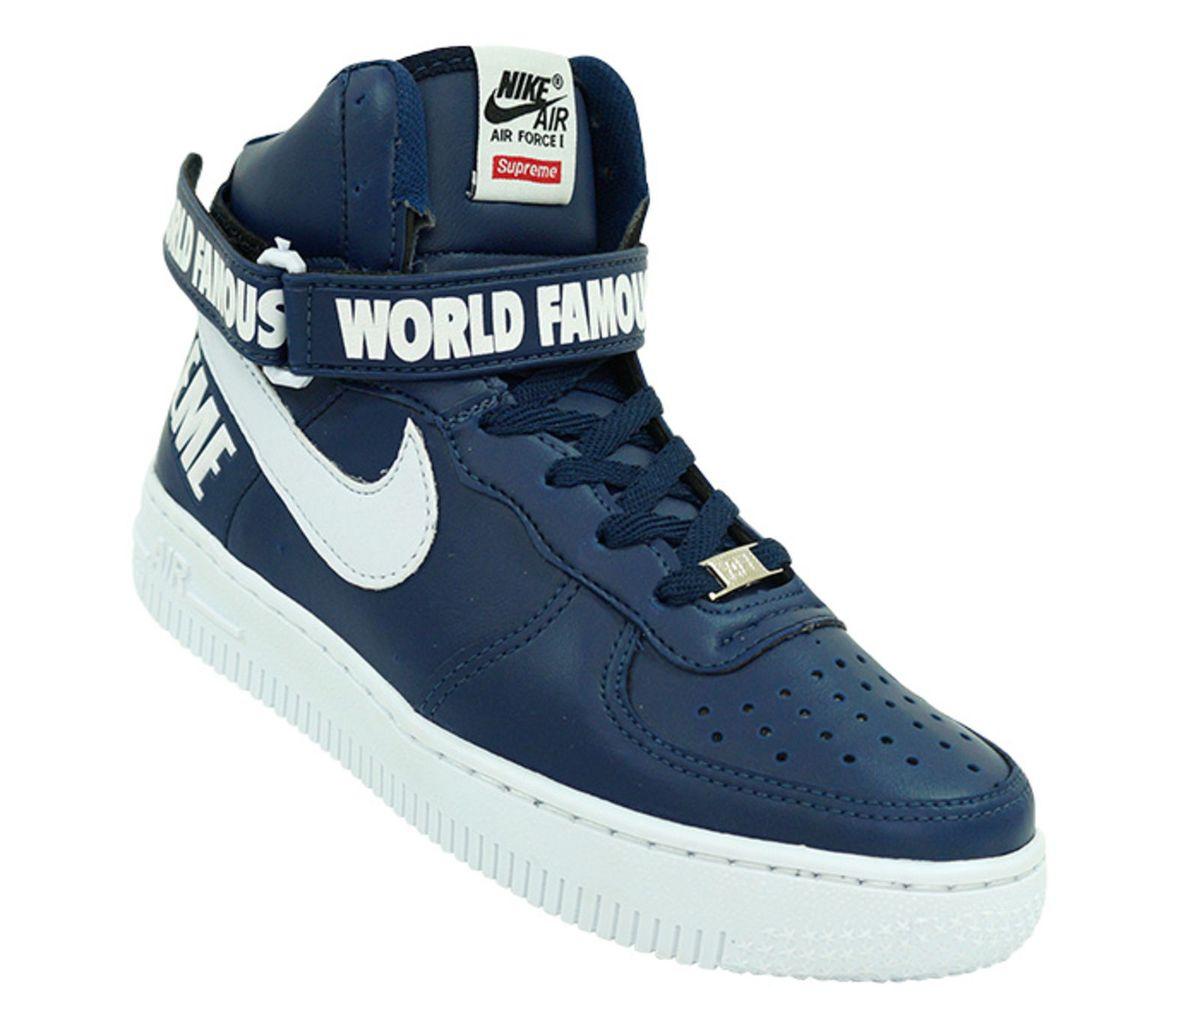 d5f0160b820 bota nike air force supreme cano alto - botas bota-nike